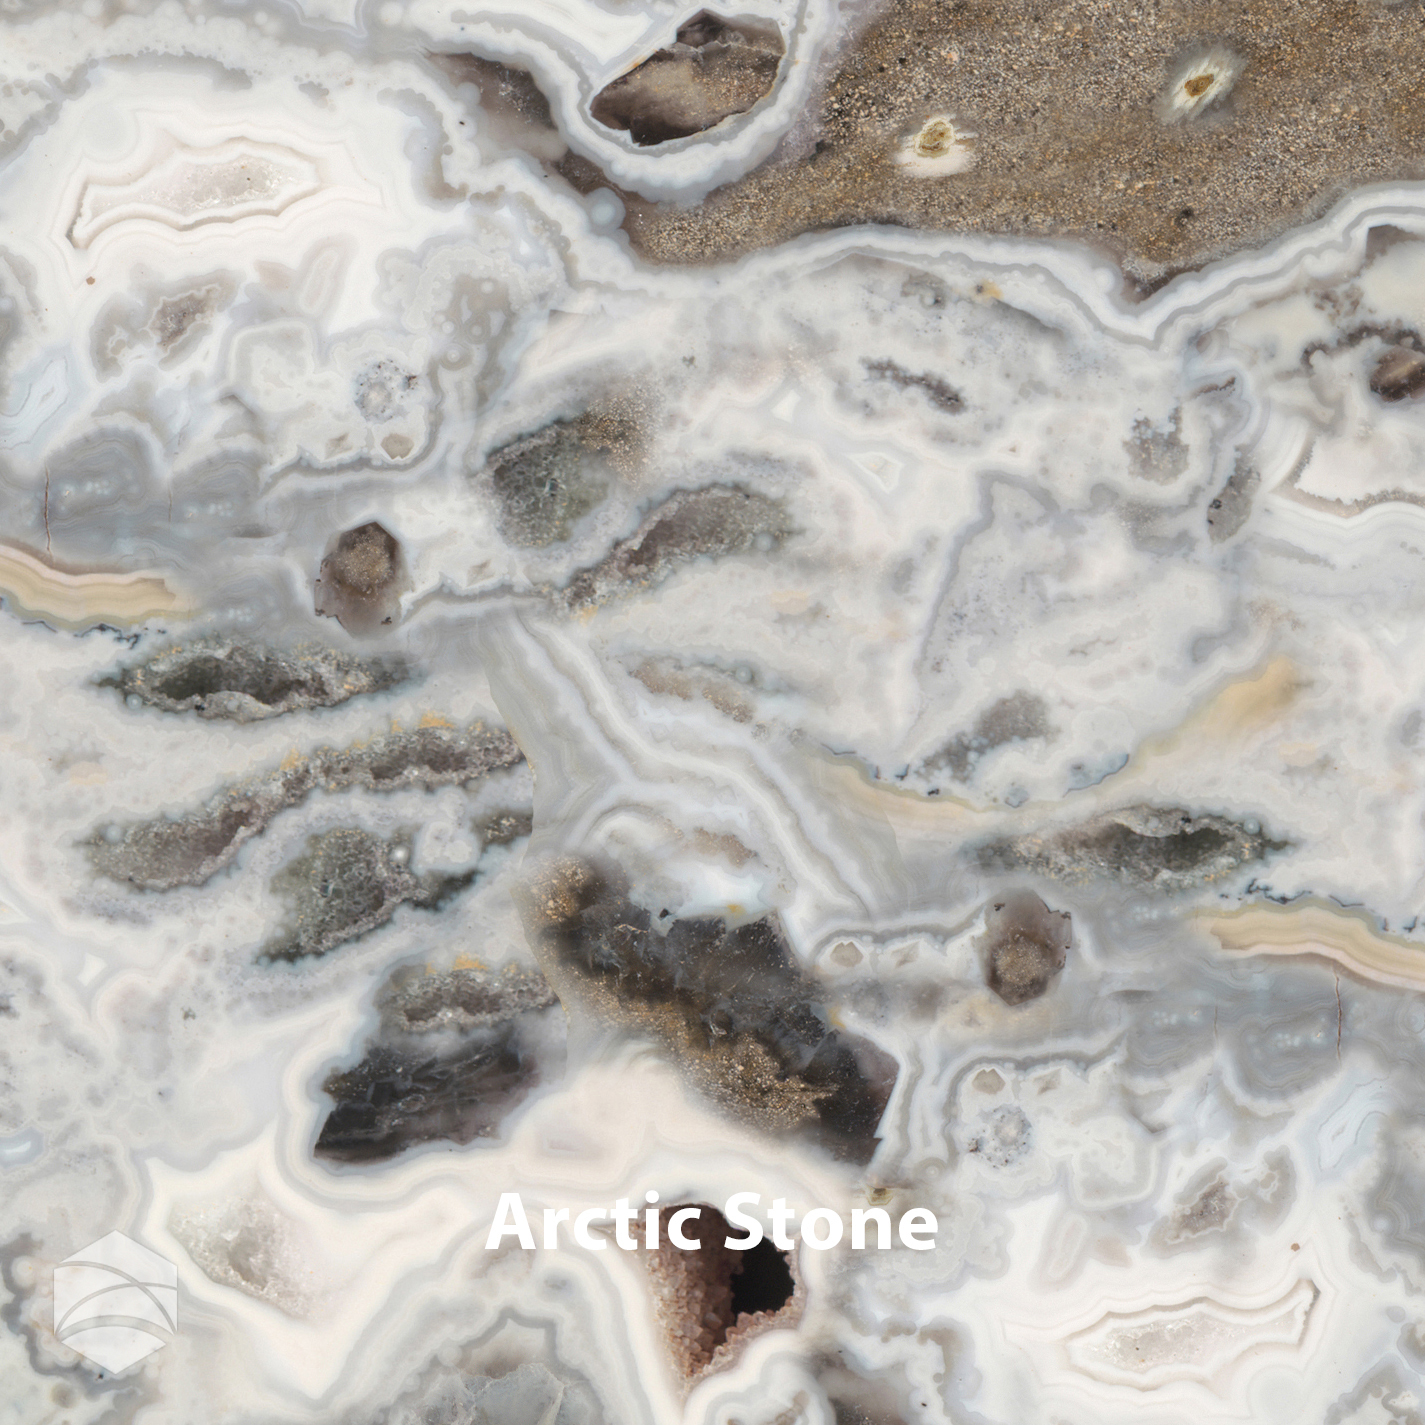 Arctic Stone_V2_14x14.jpg